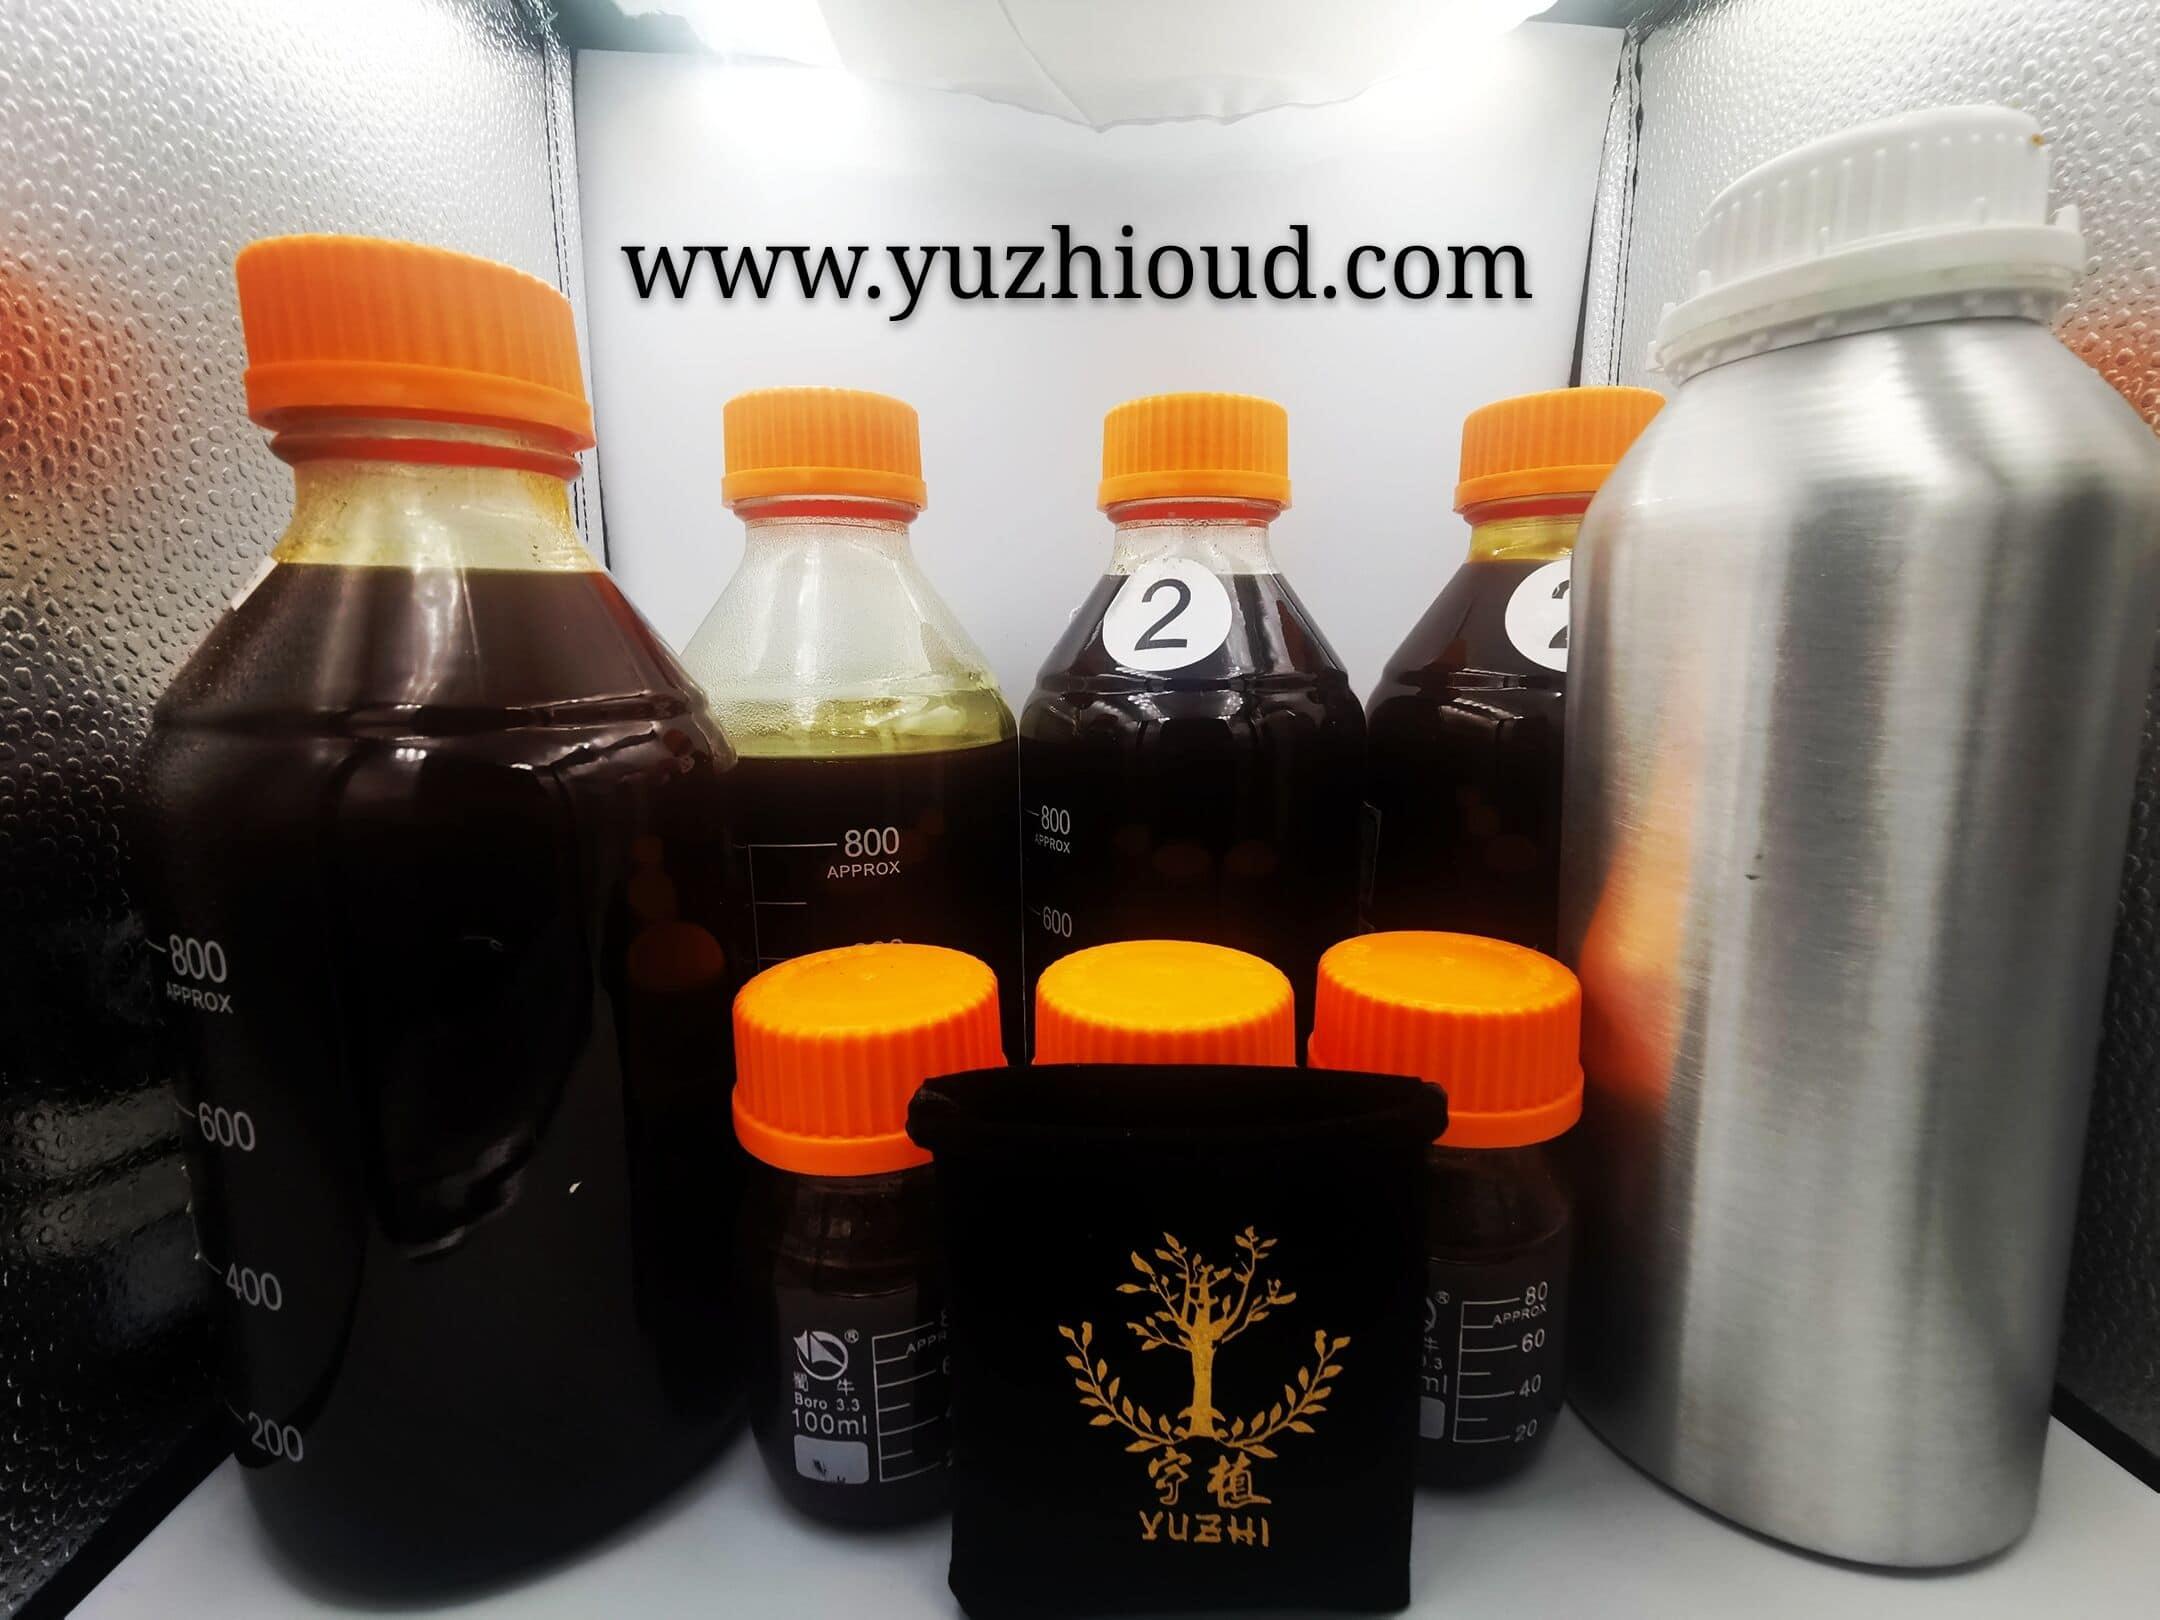 Yuzhi Oud